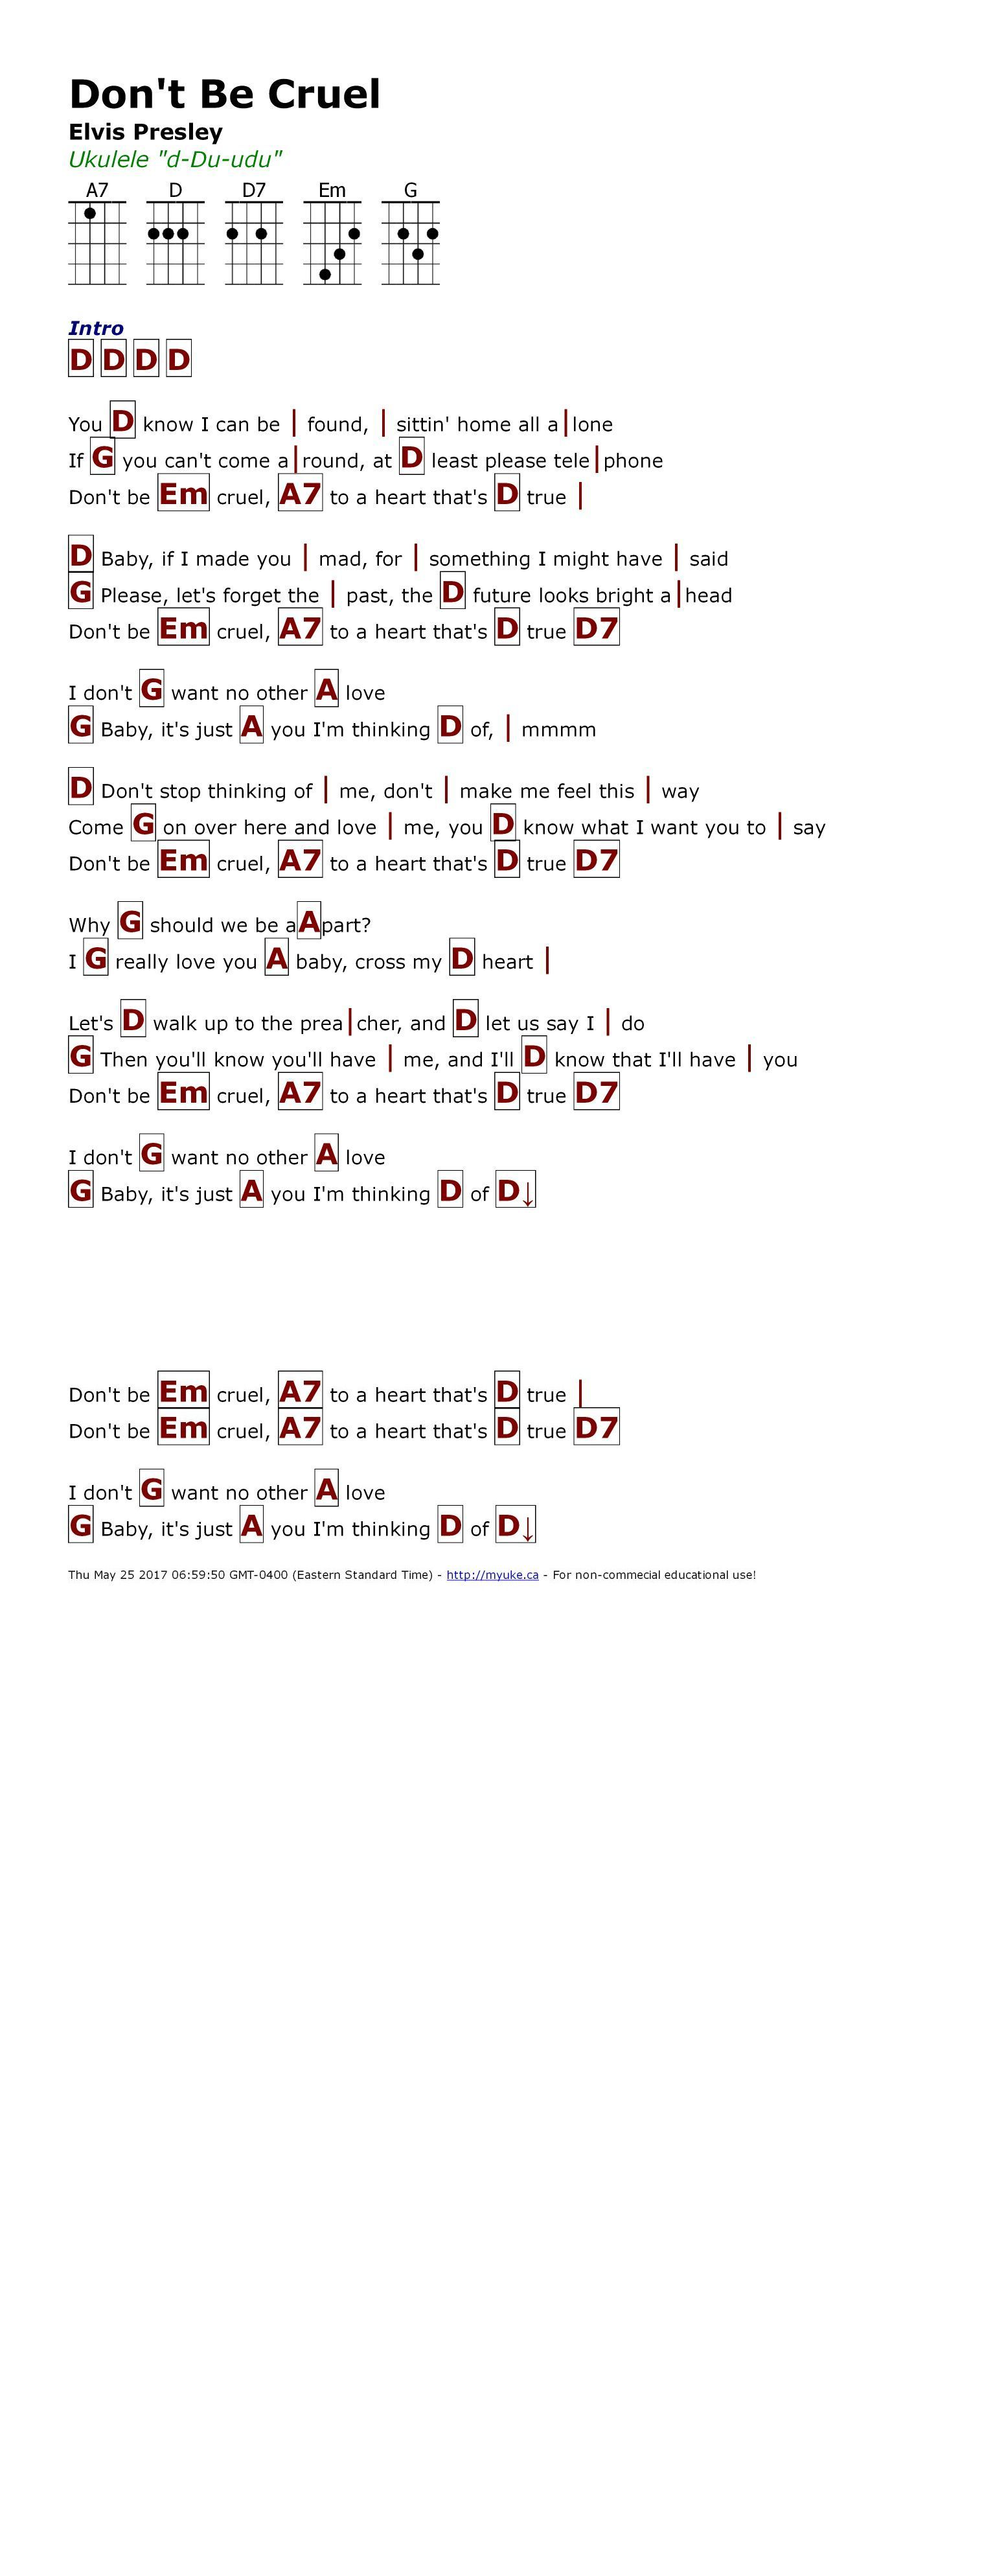 Don T Be Cruel Elvis Presley Http Myuke Ca Ukulele Songs Ukulele Chords Songs Ukelele Chords Songs